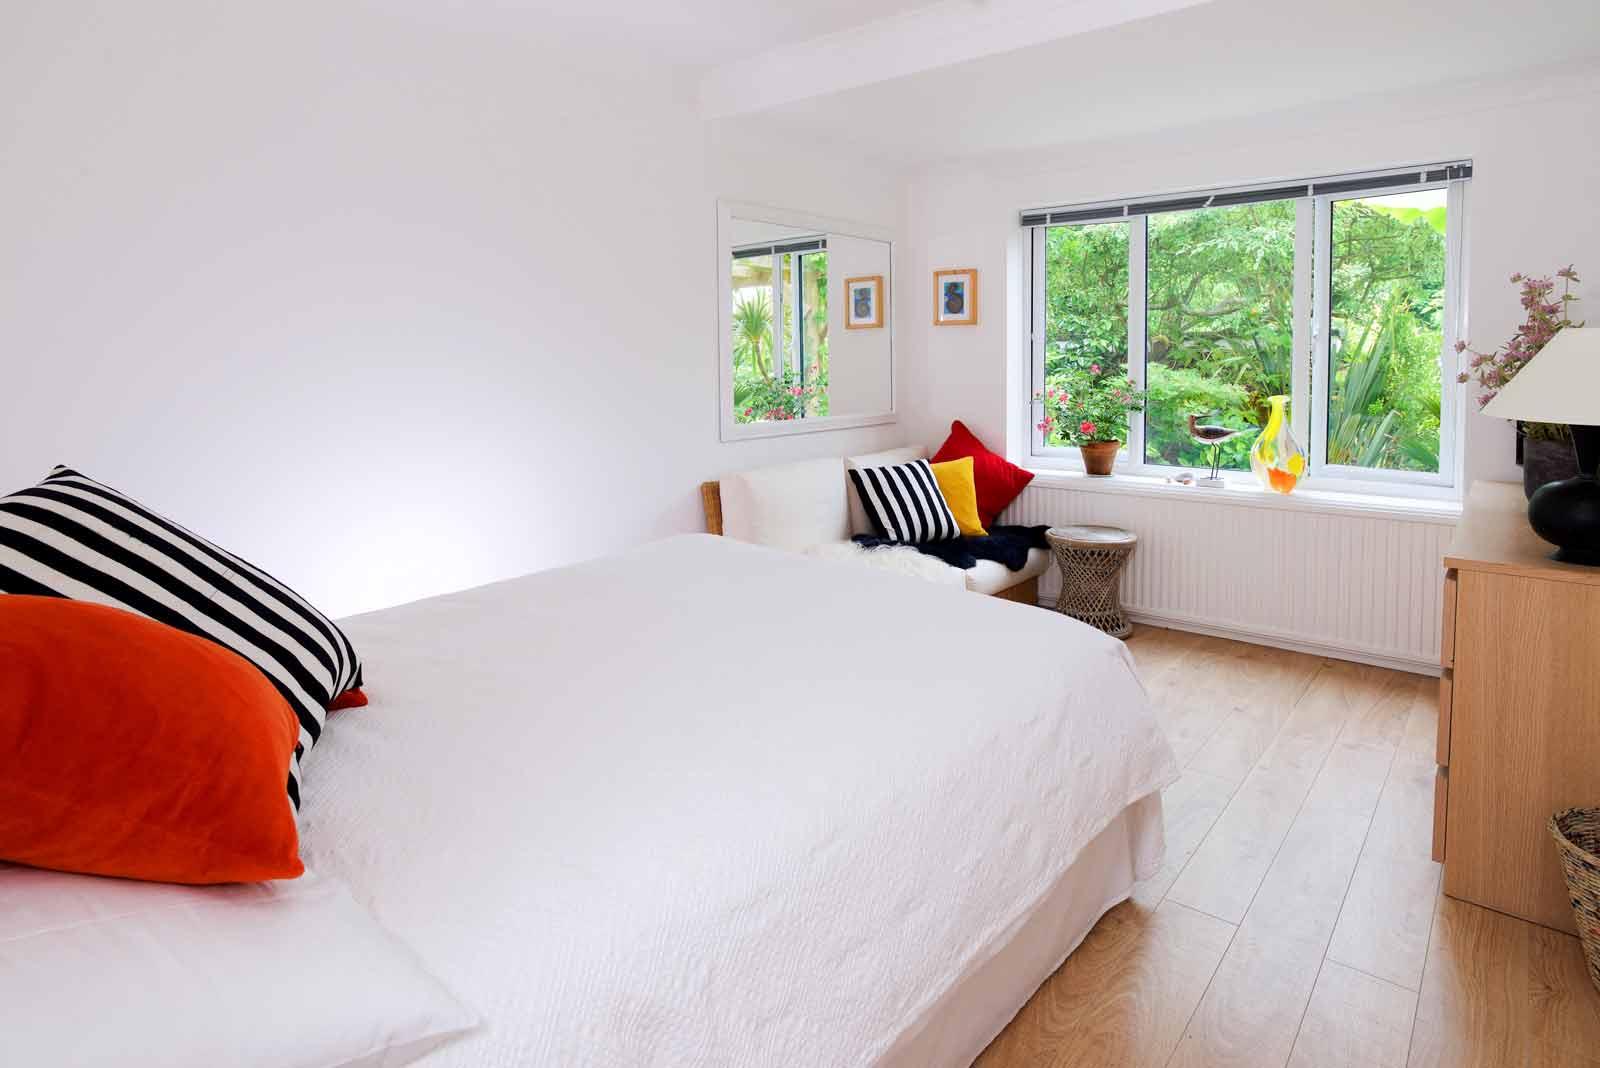 Lulworth House B&B Garden Room